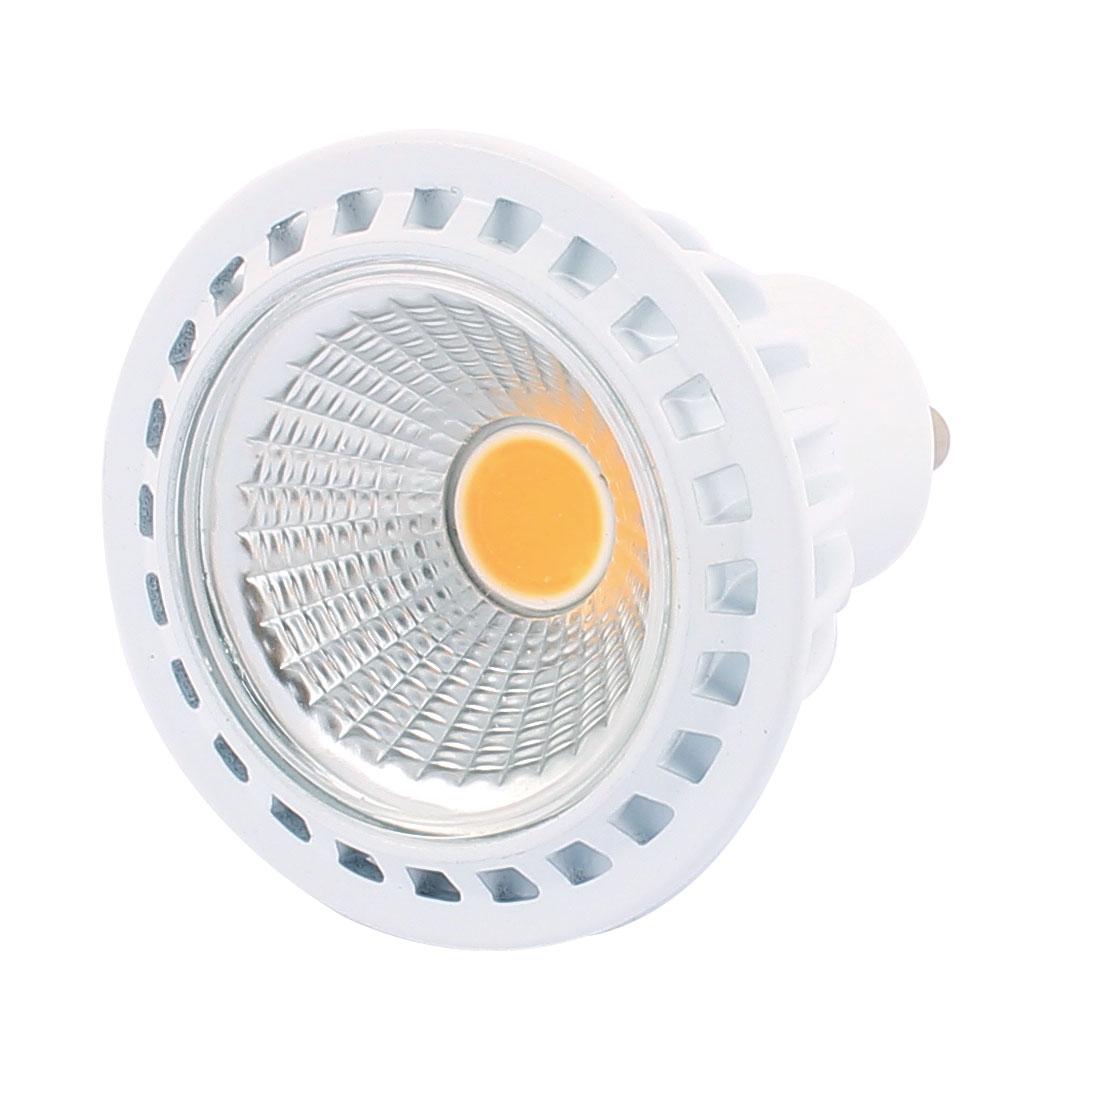 AC85-265V 3W Ultra Bright GU10 COB LED Spotlight Lamp Bulb Downlight Warm White